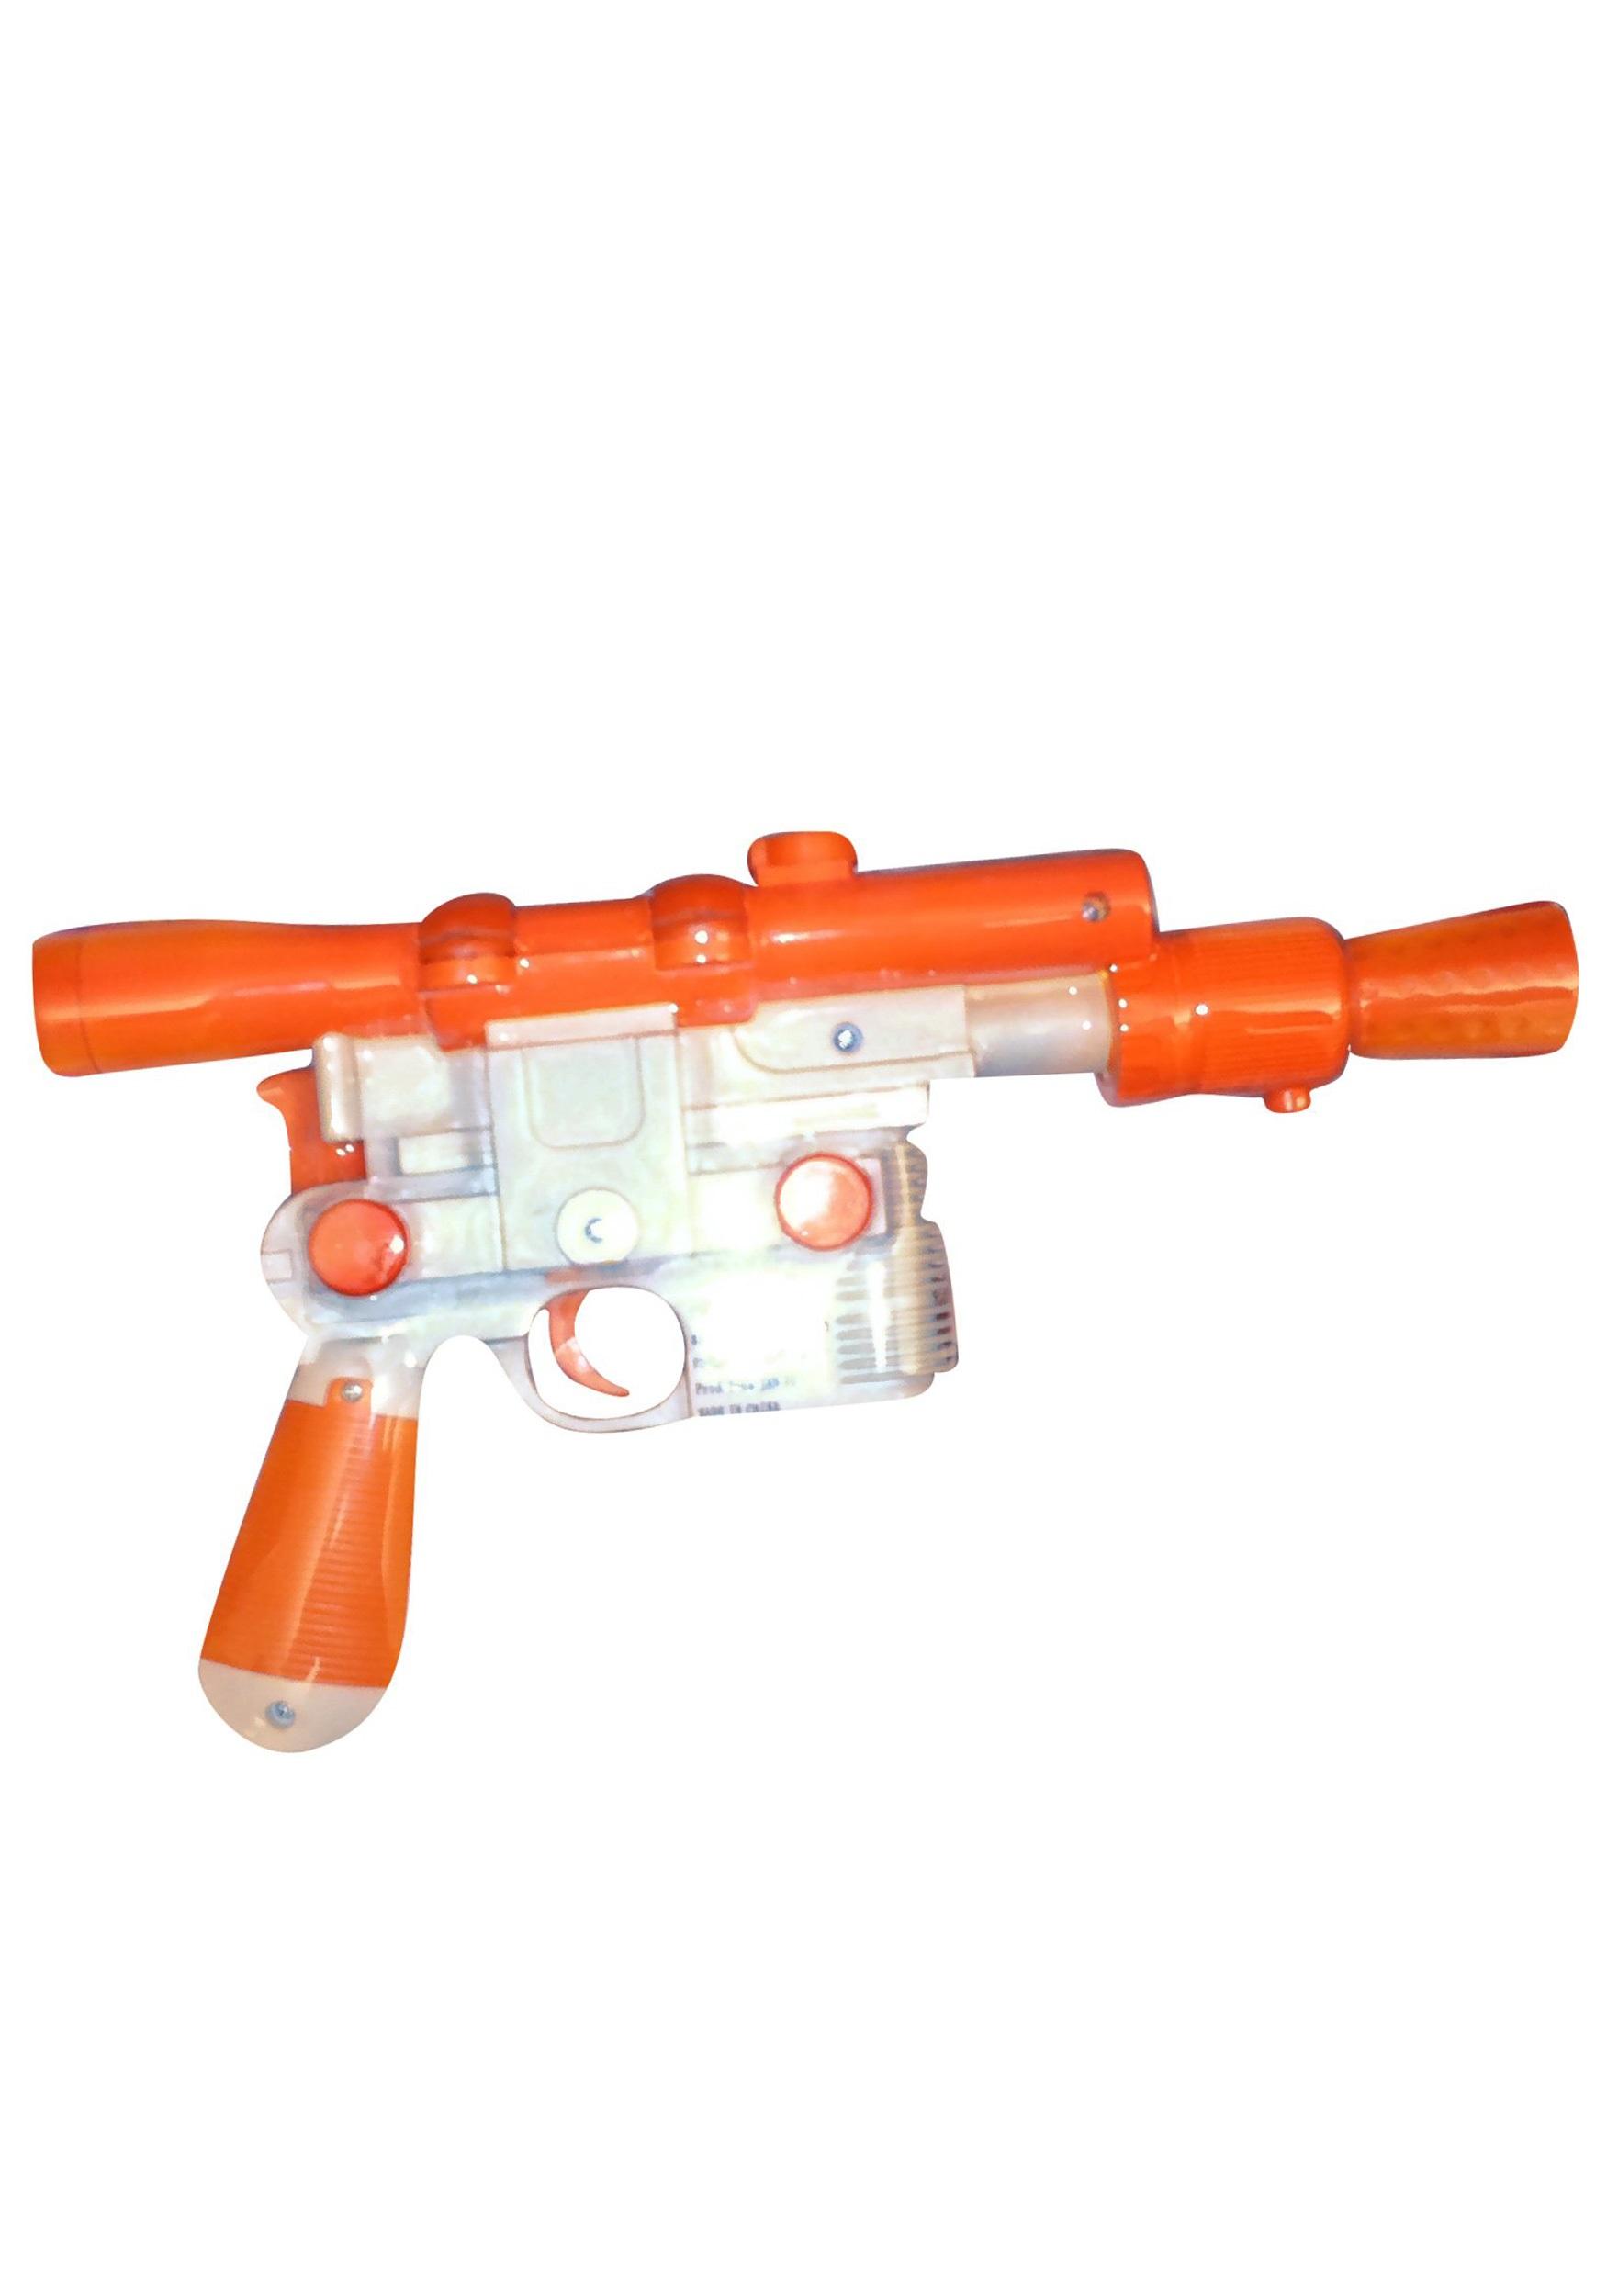 Star Wars Toy Han Solo Blaster RU8242